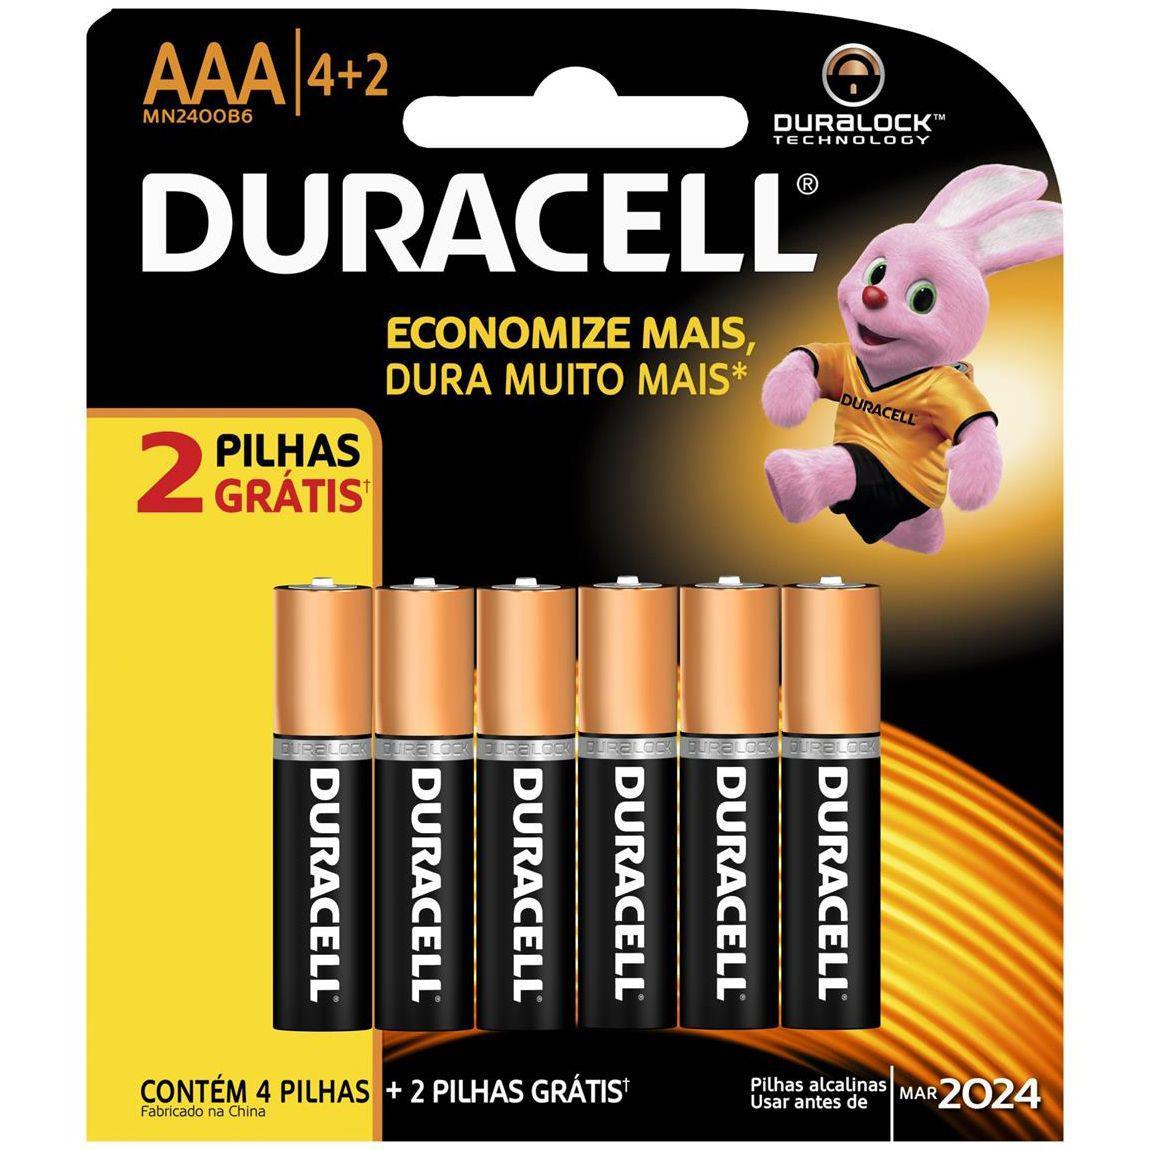 Aaa Mastercard Login >> Pilha Palito AAA Leve 6 Pague 4 - Duracell - Pilhas ...